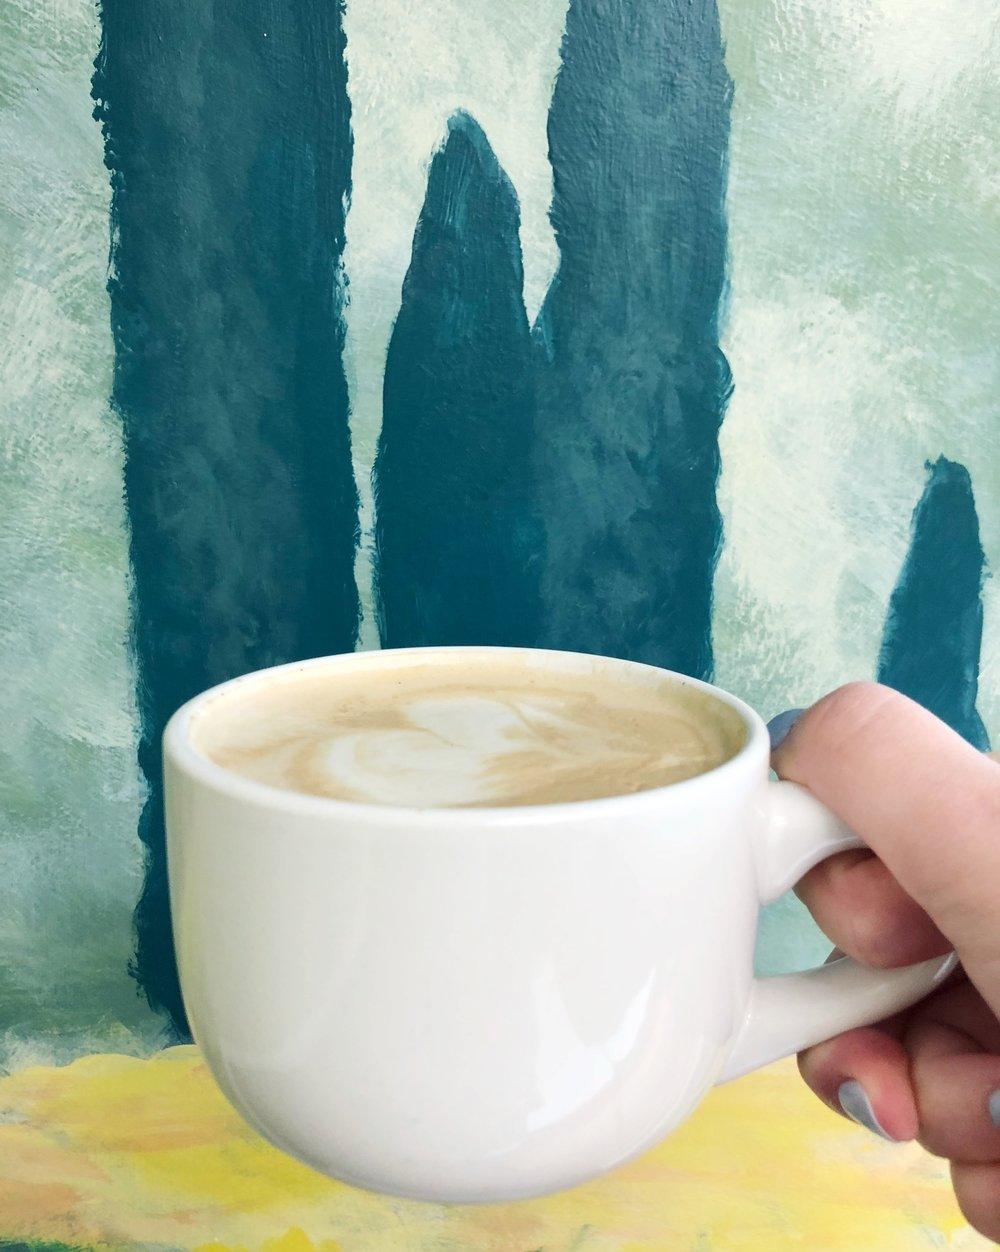 vanilla-soy-latte-sunflour-baking-company-harrisburg-nc